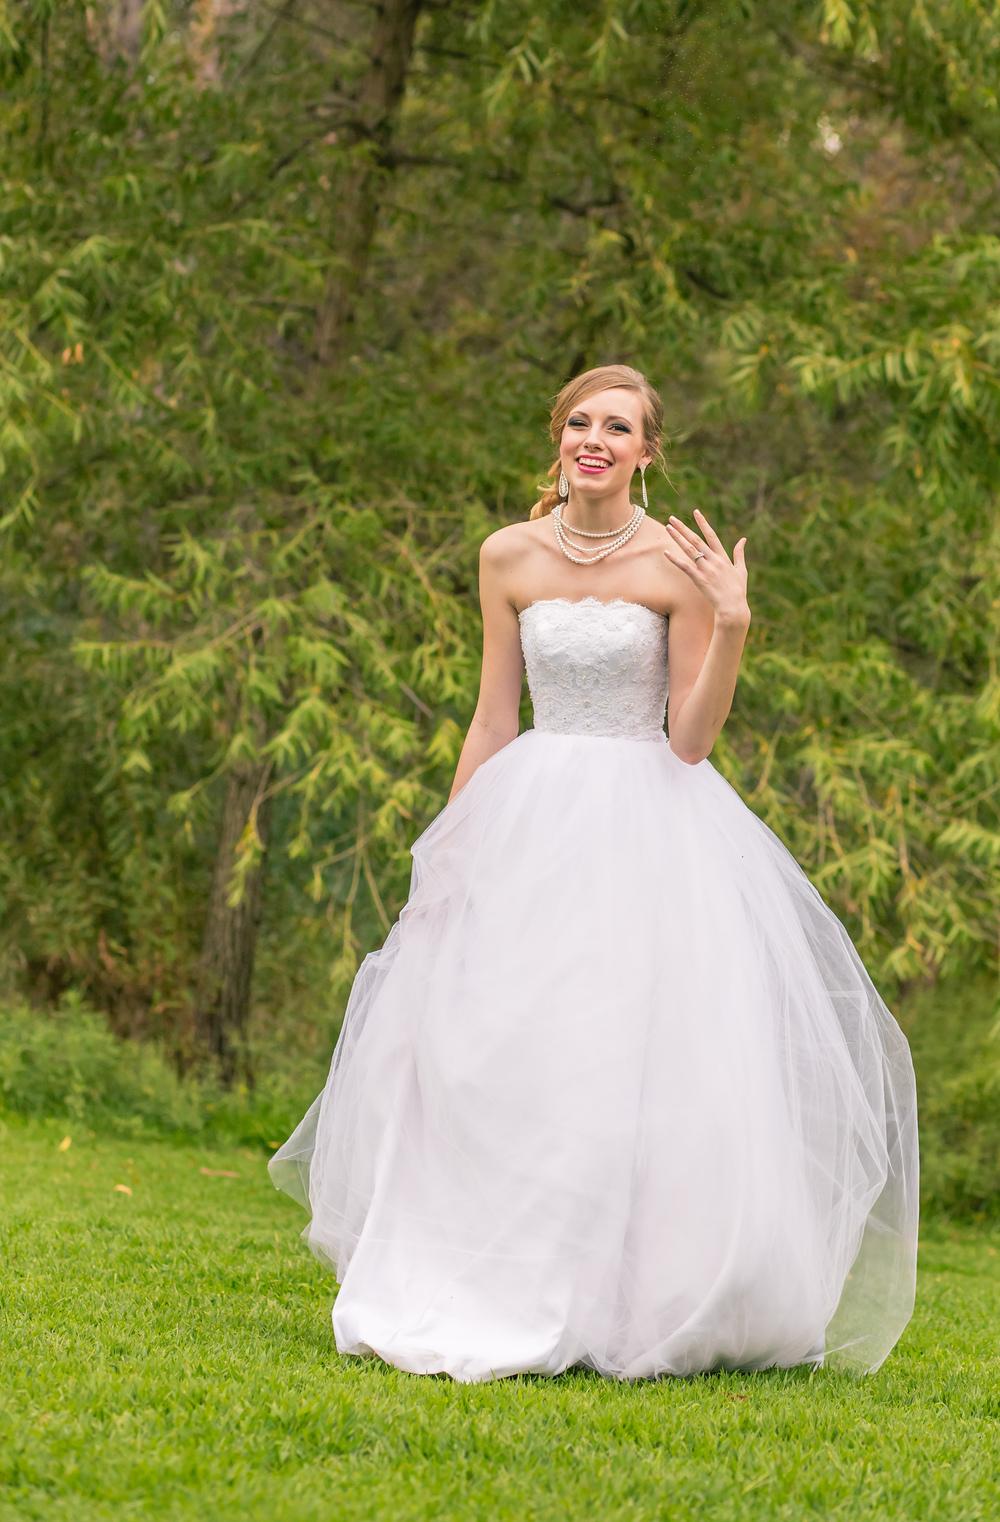 brides-2229.jpg